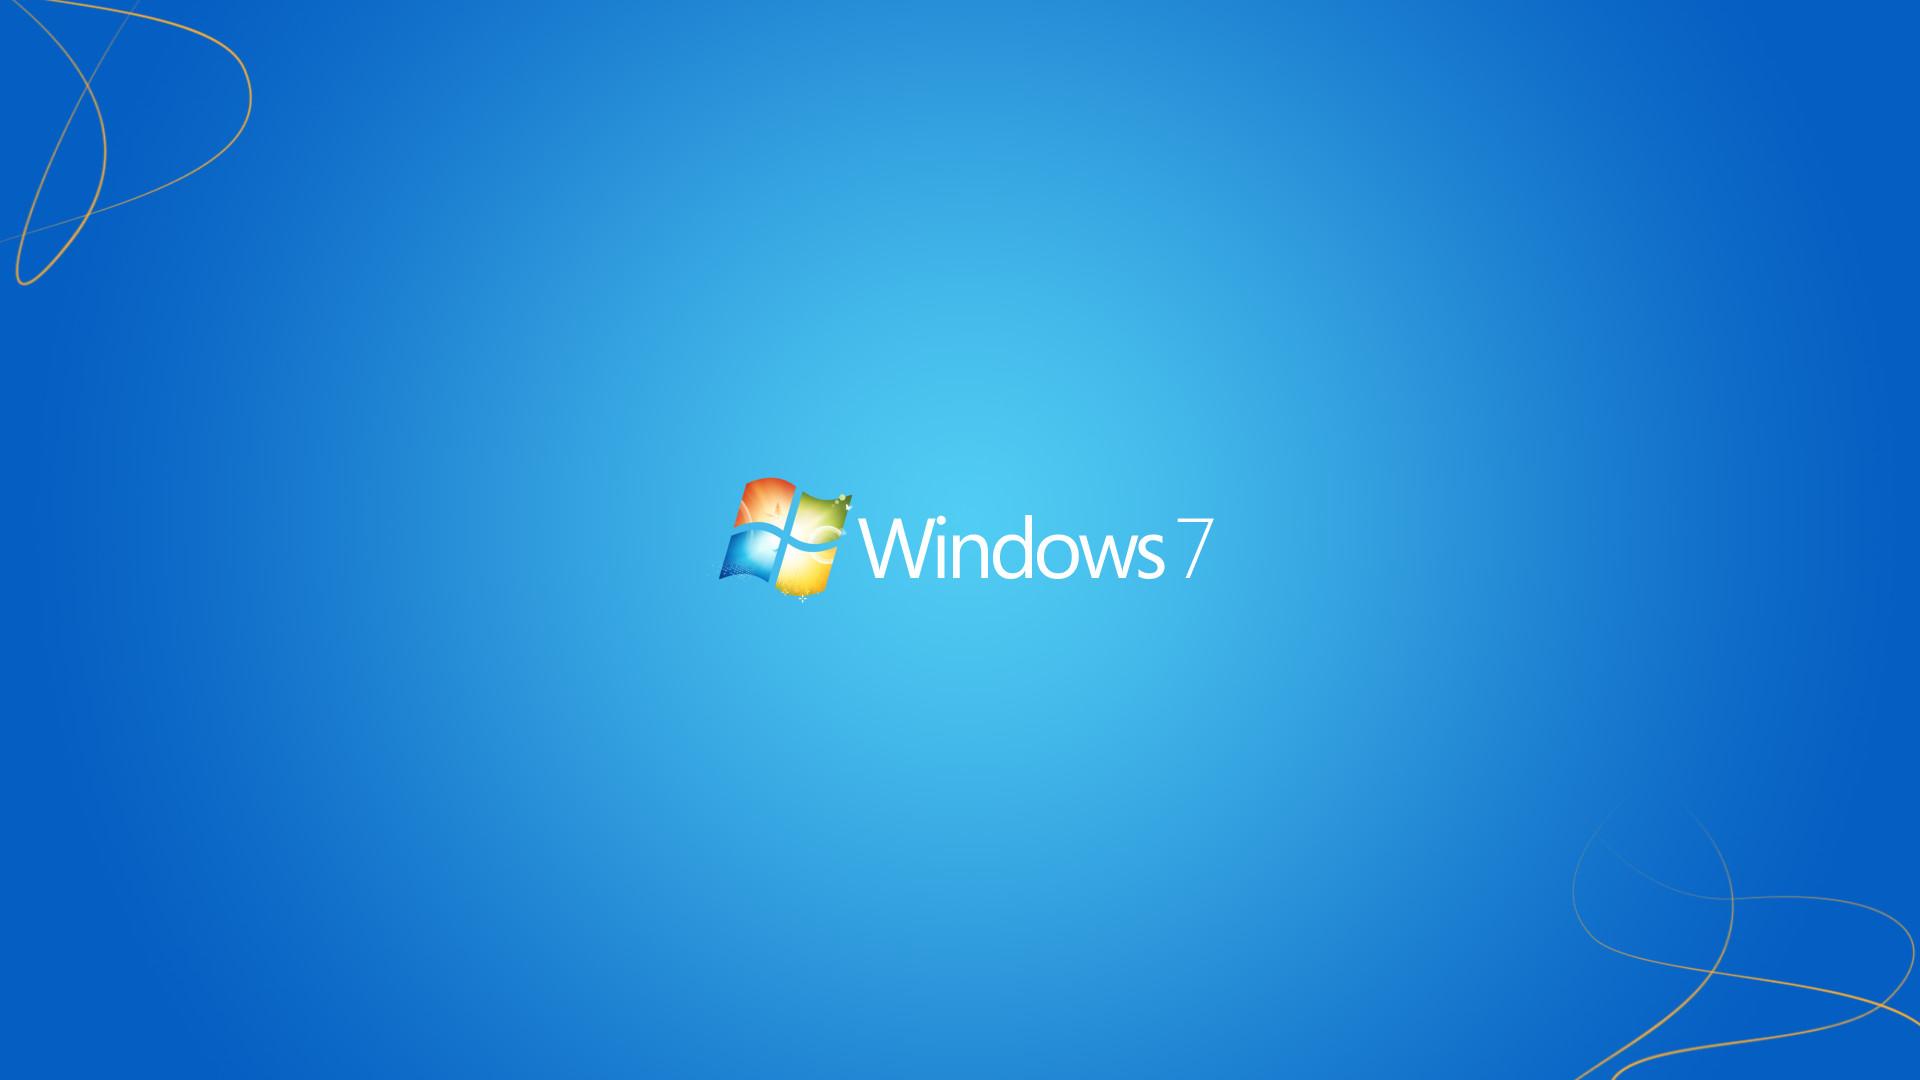 1920x1080, Desktop Images Of Windows - Operating System - HD Wallpaper